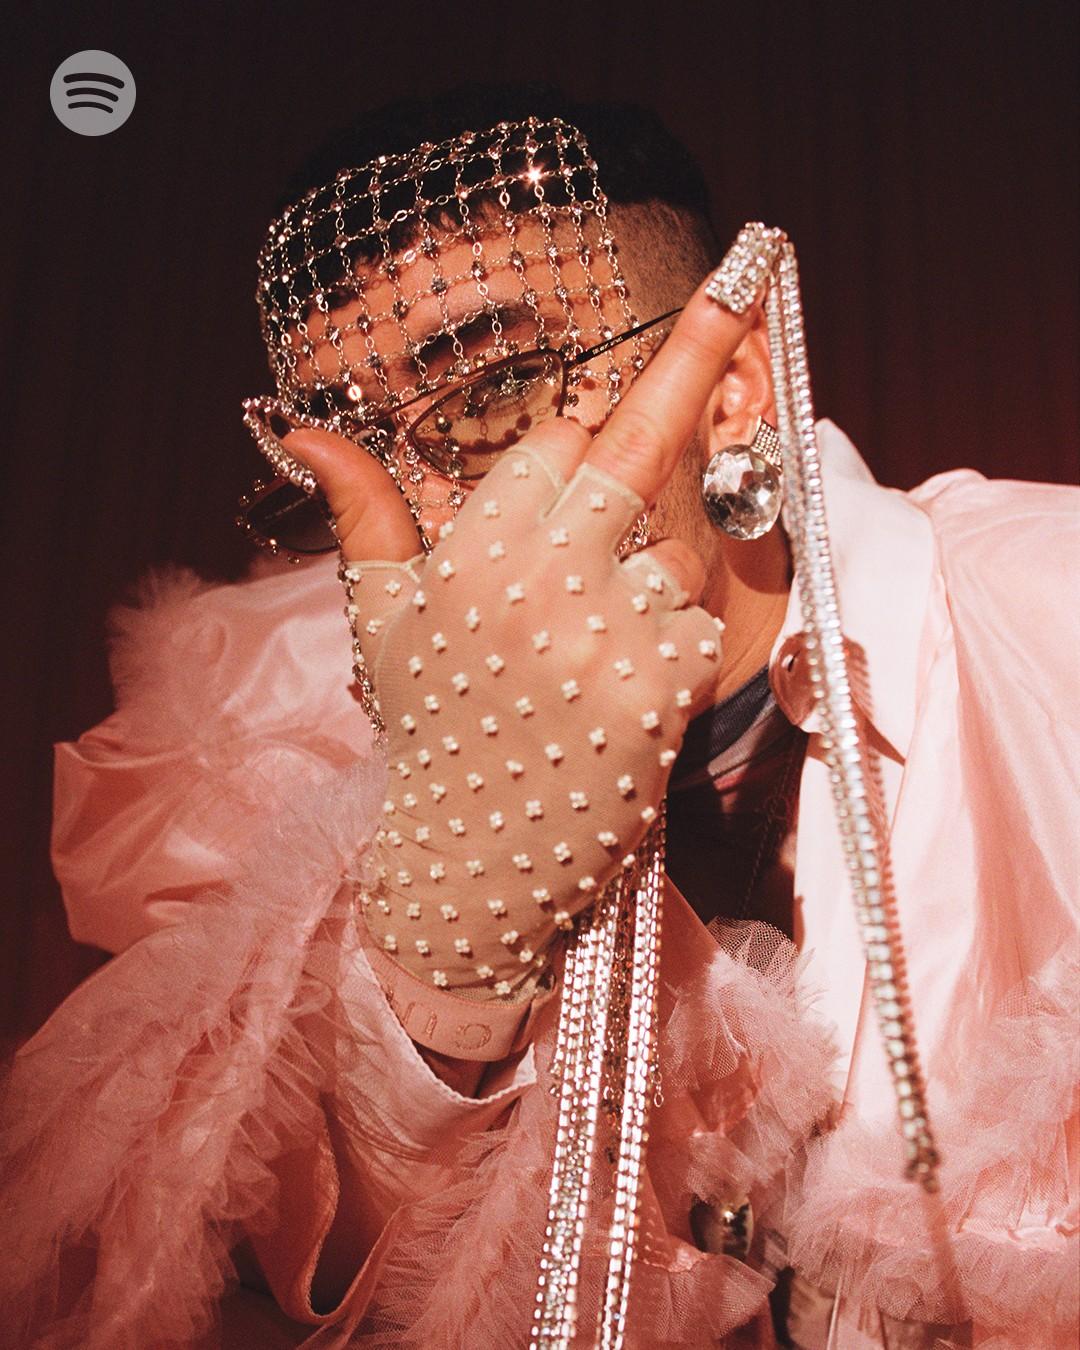 Bad Bunny Gives Fans A Sneak Peek Of His Next Album Via Stylish Lookbook Exclusive Billboard